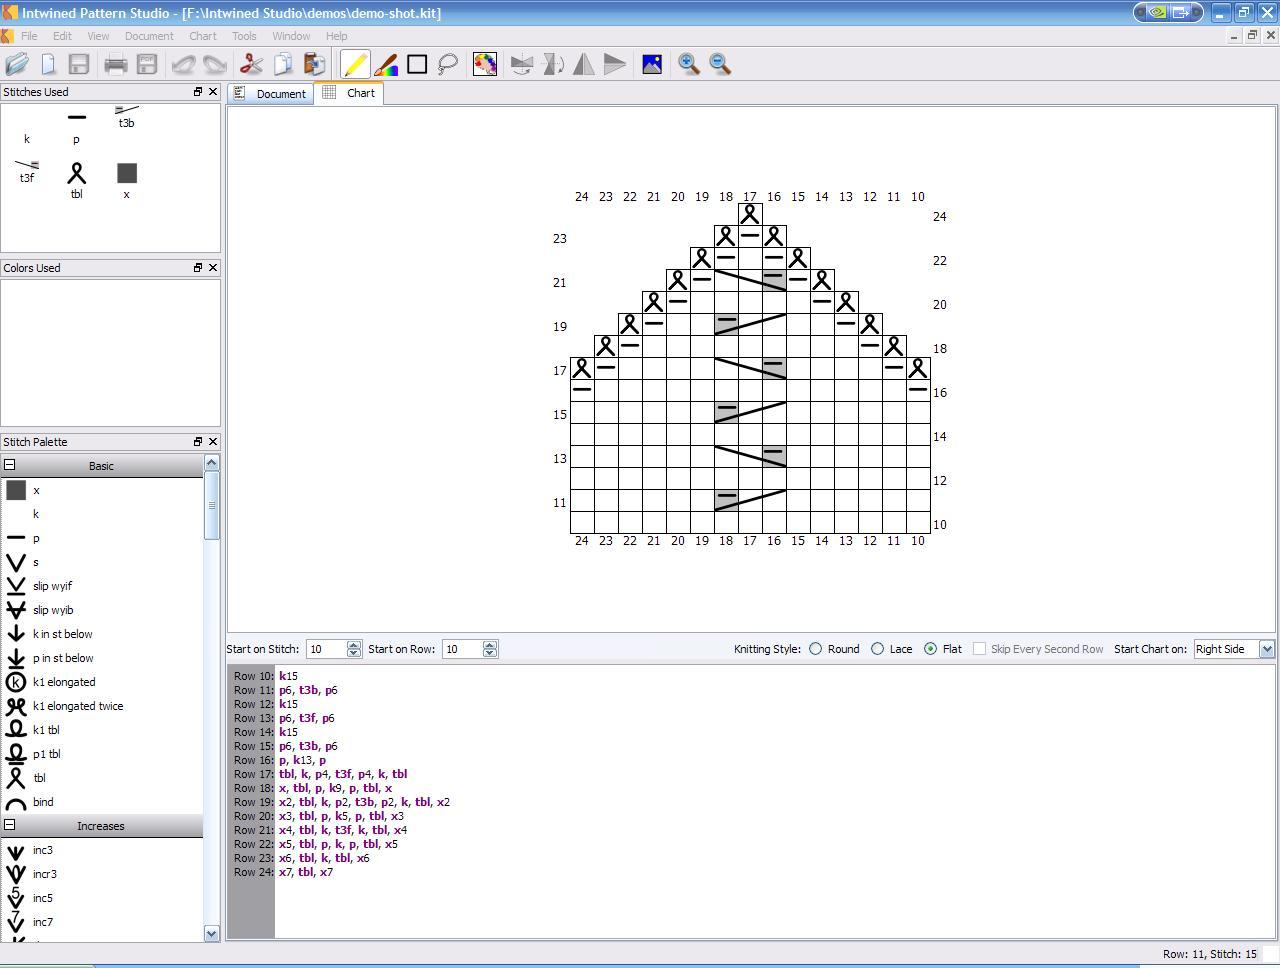 Intwined Pattern Studio